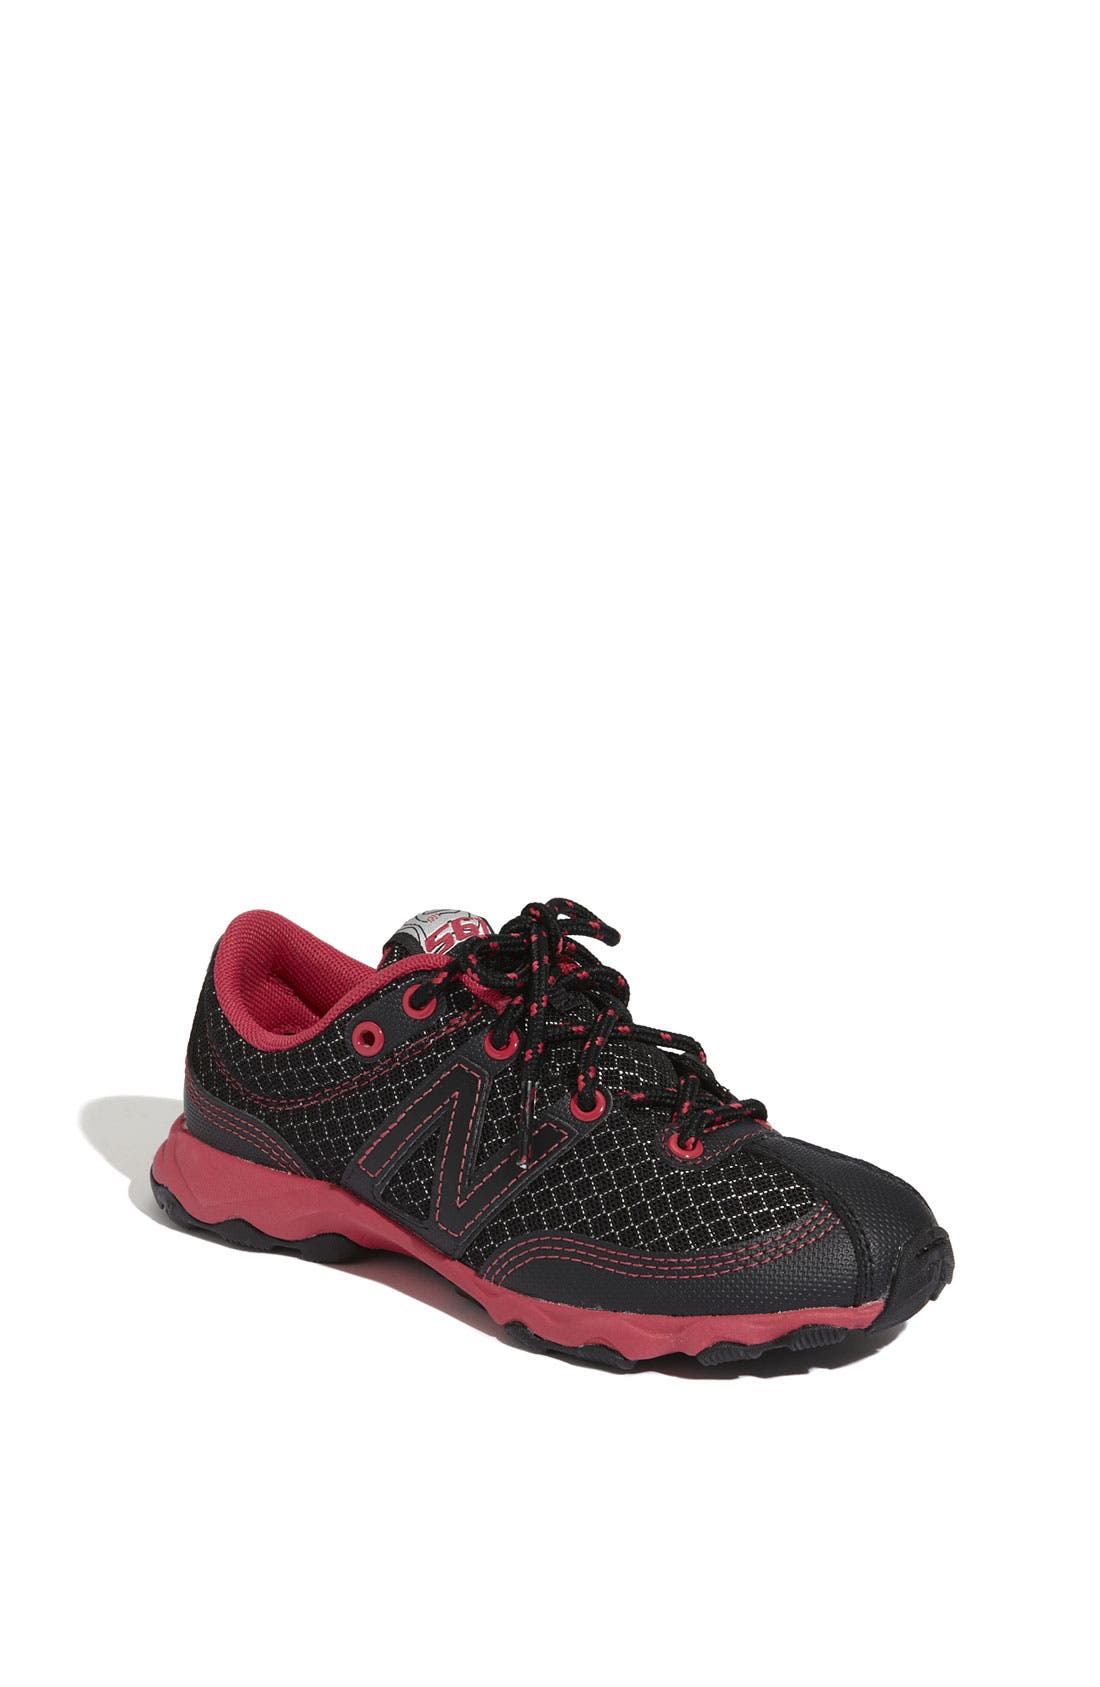 Alternate Image 1 Selected - New Balance '561' Trail Running Shoe (Toddler, Little Kid & Big Kid)